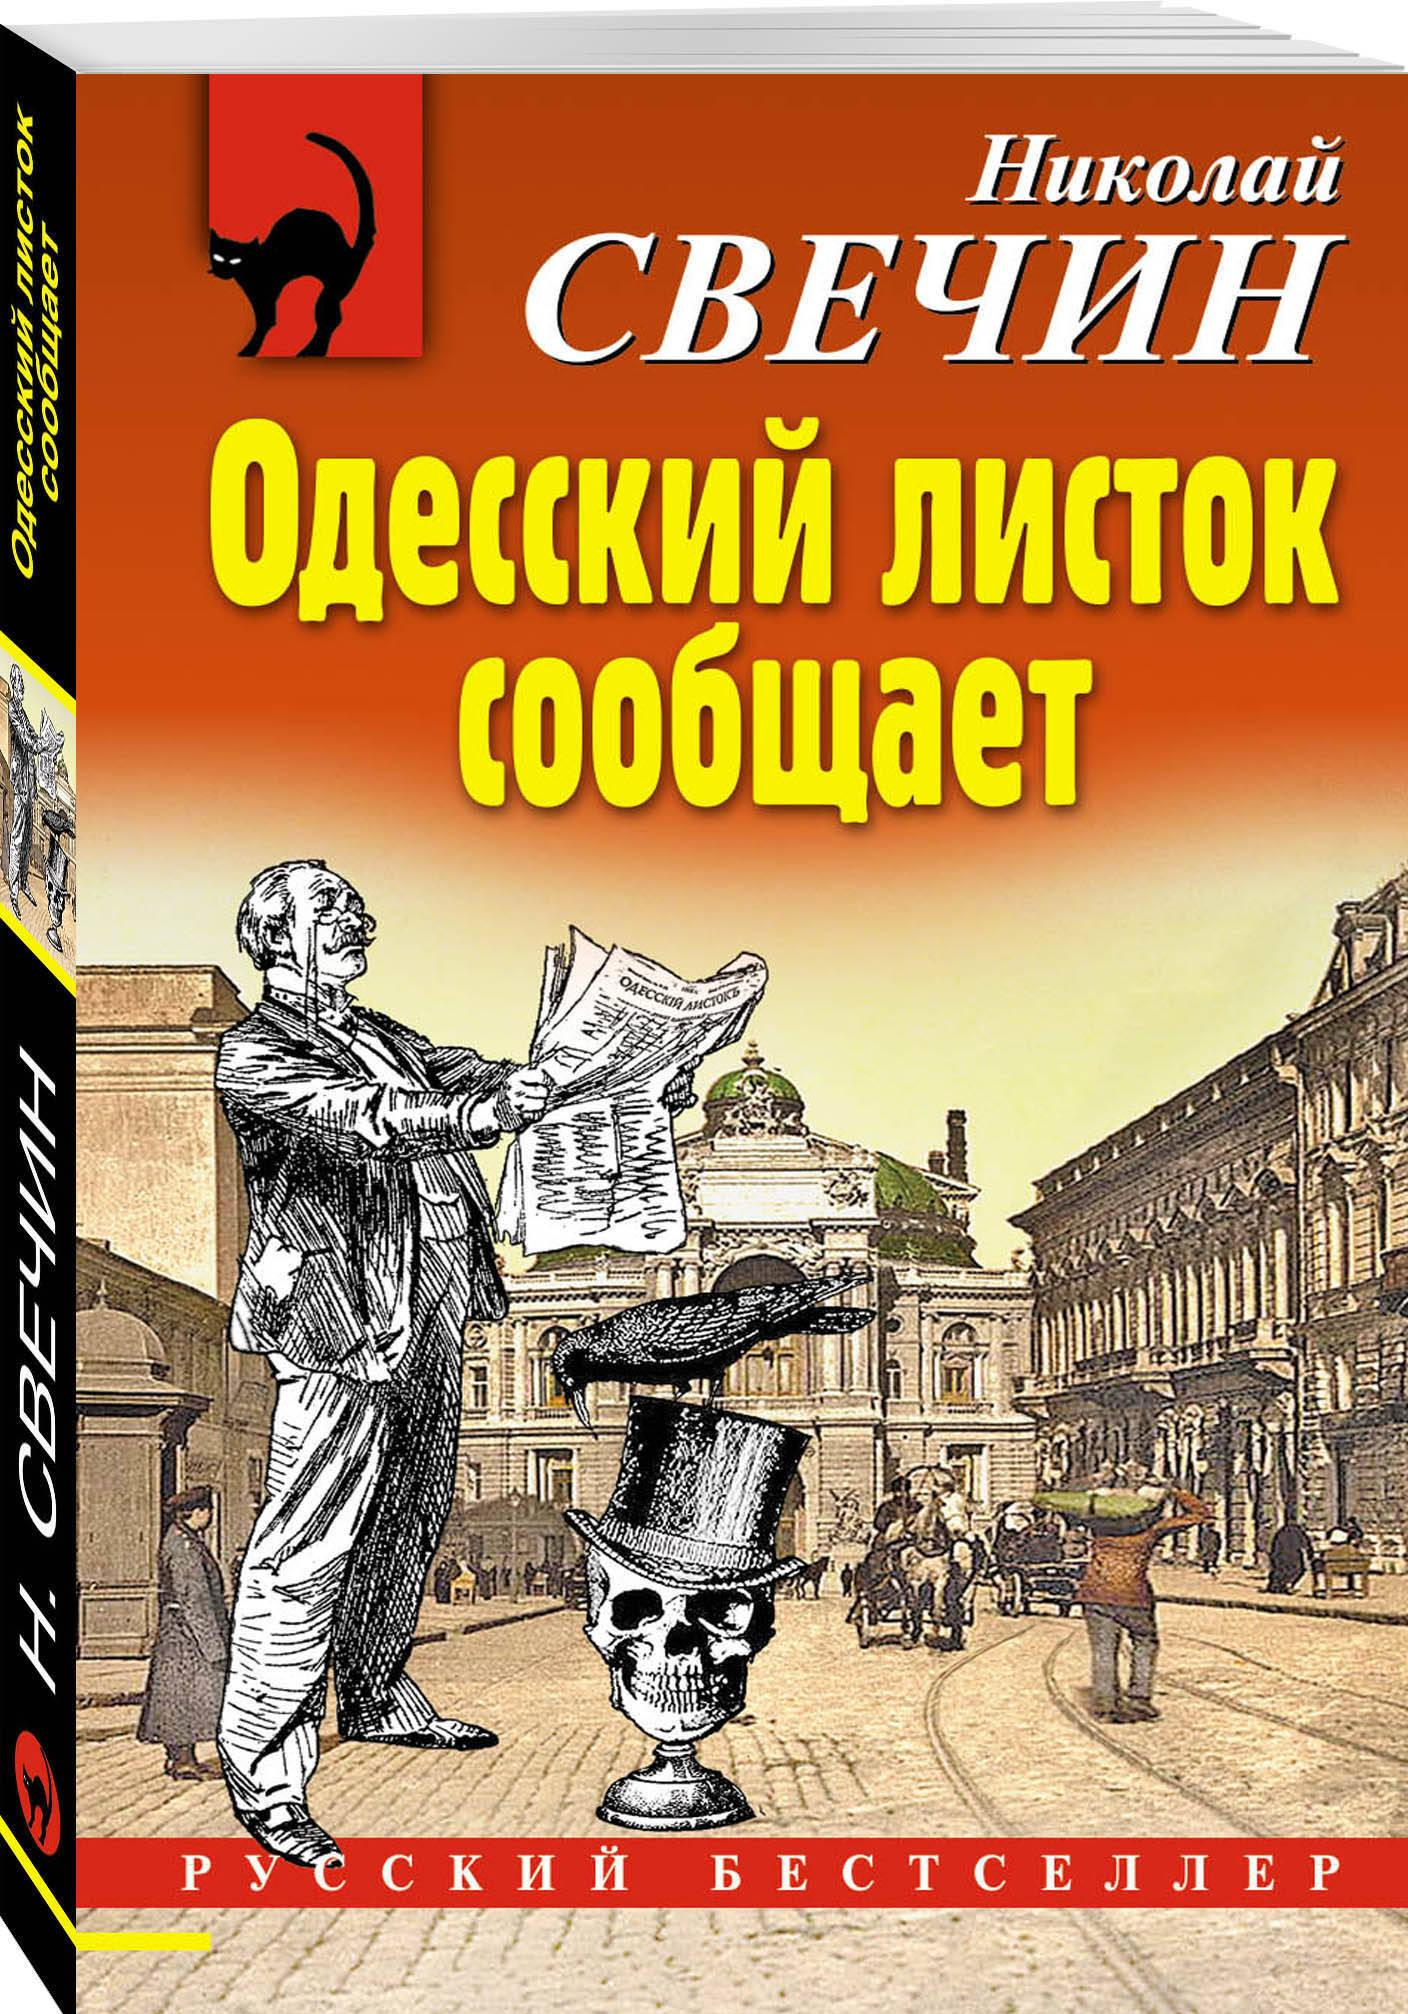 Odesskij listok soobschaet | Svechin Nikolaj